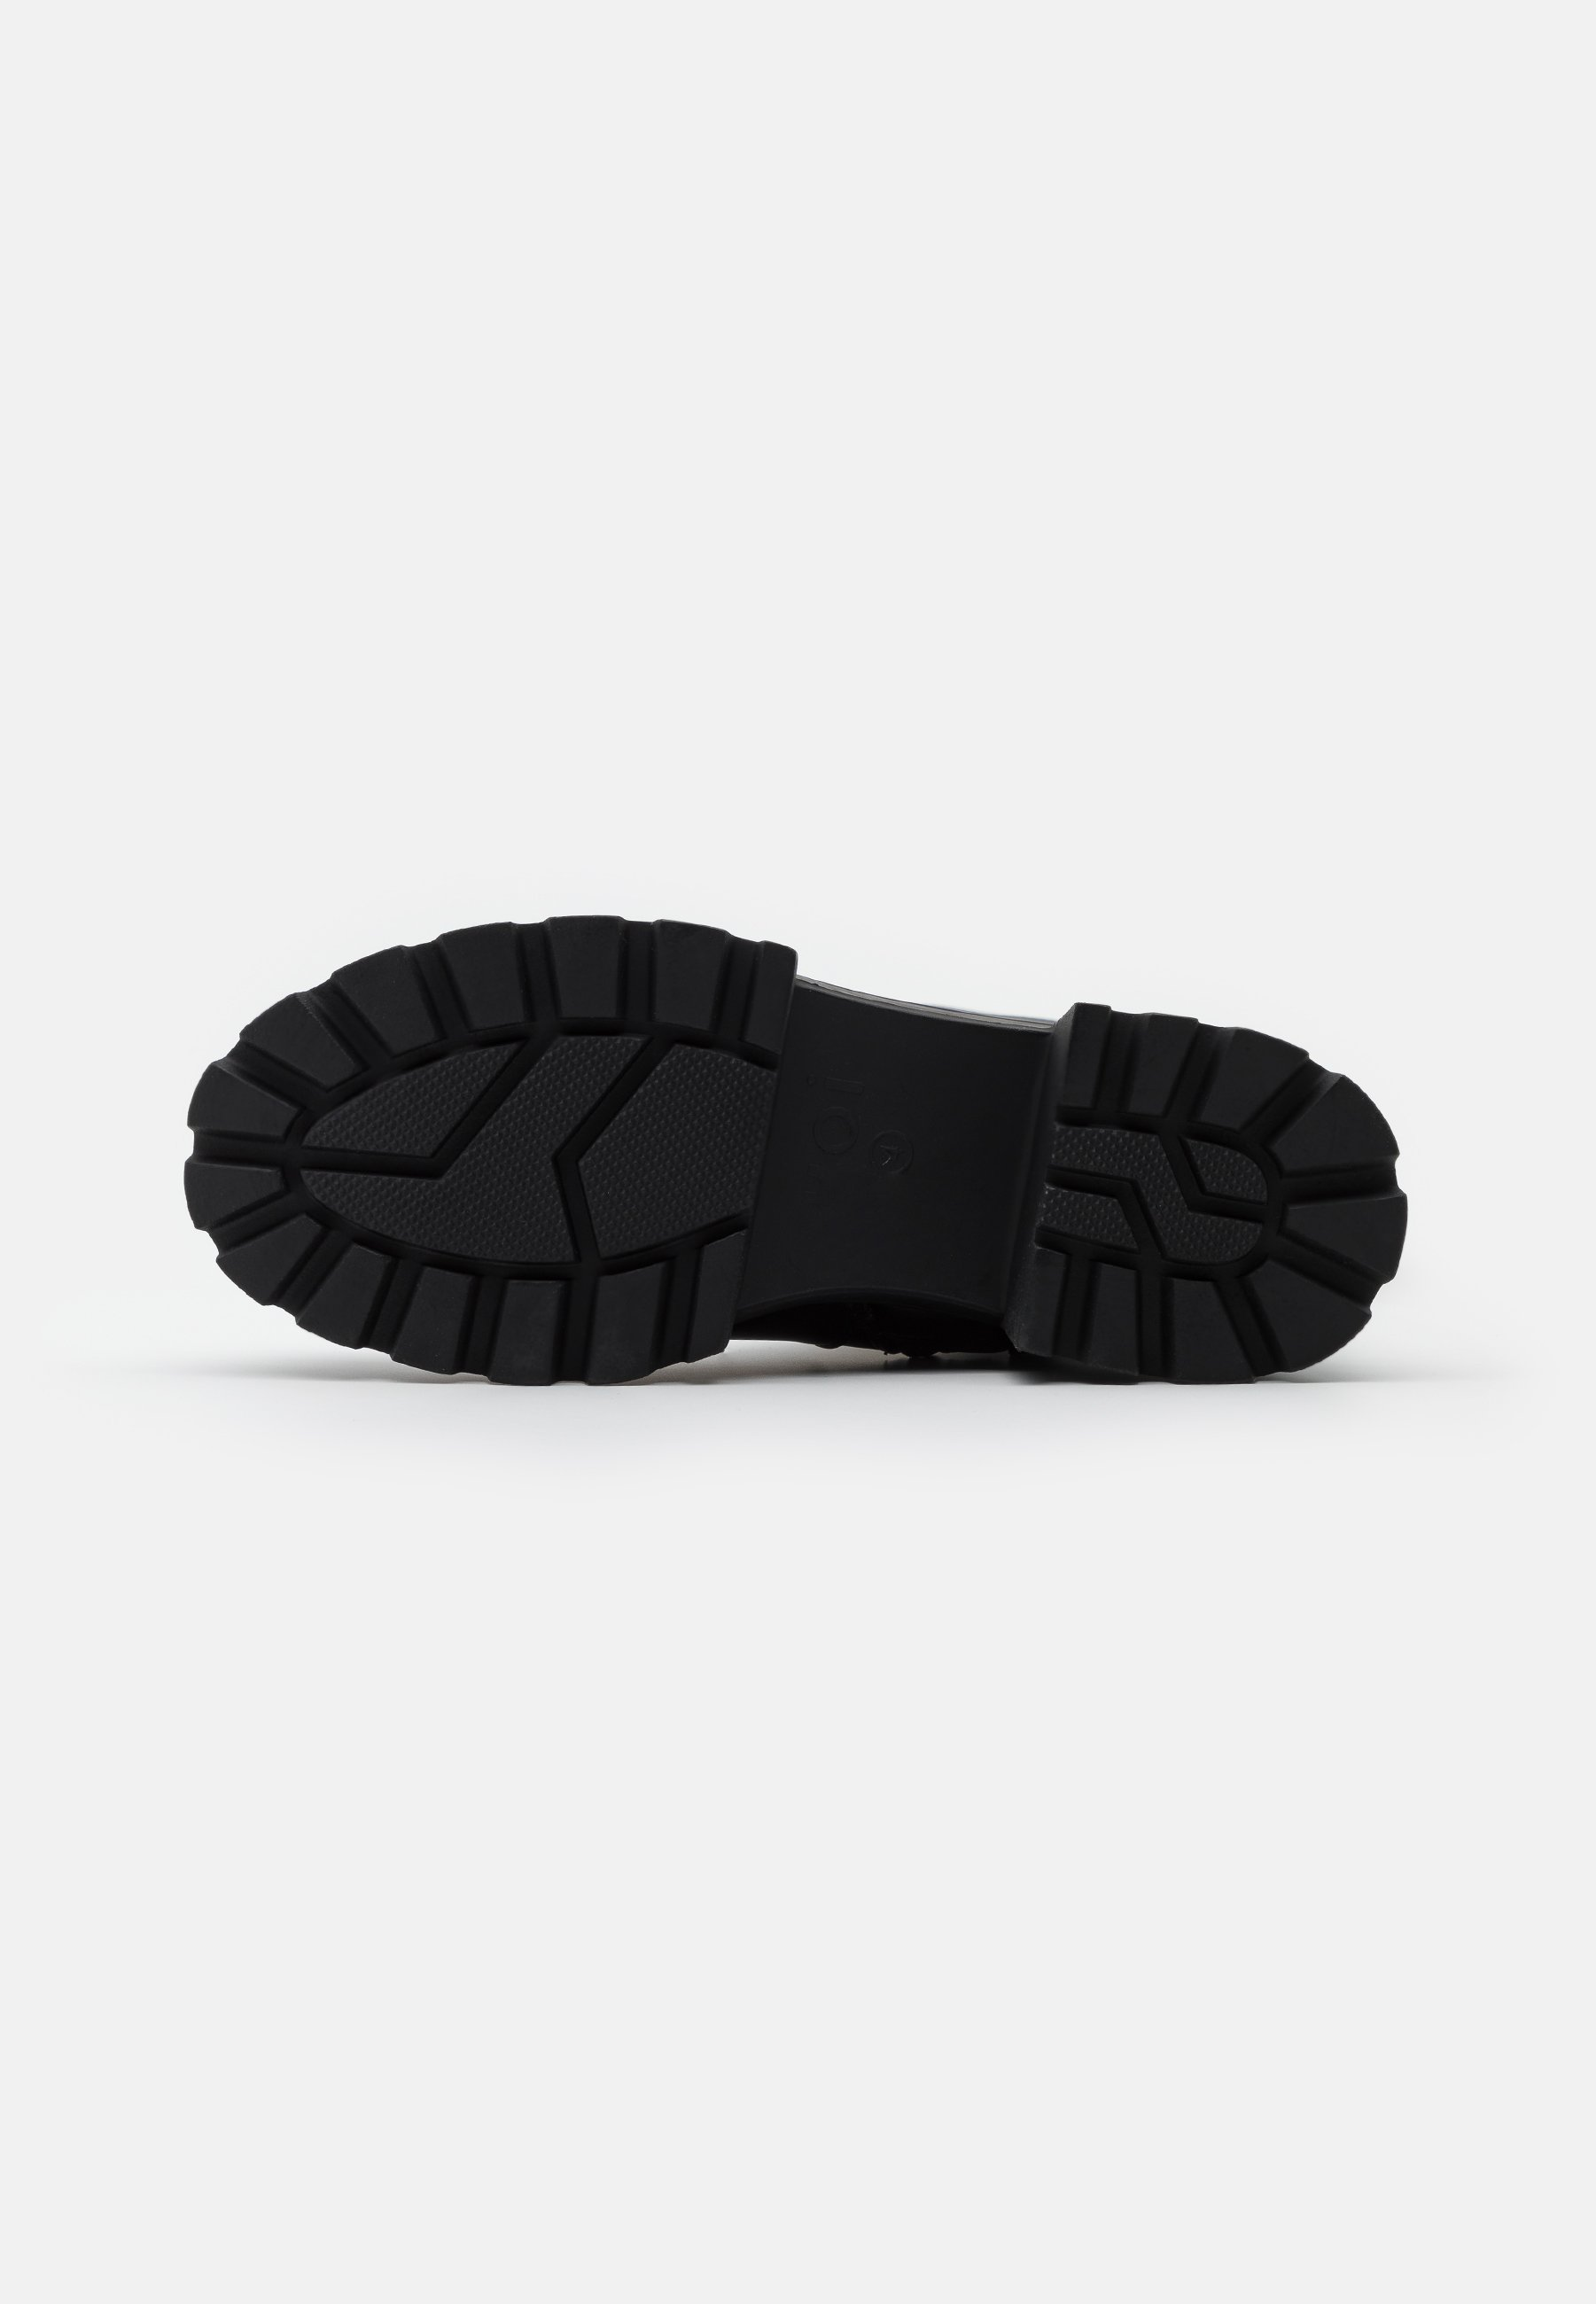 Koi Footwear VEGAN MIDNIGHT Plateaustiefel black/schwarz